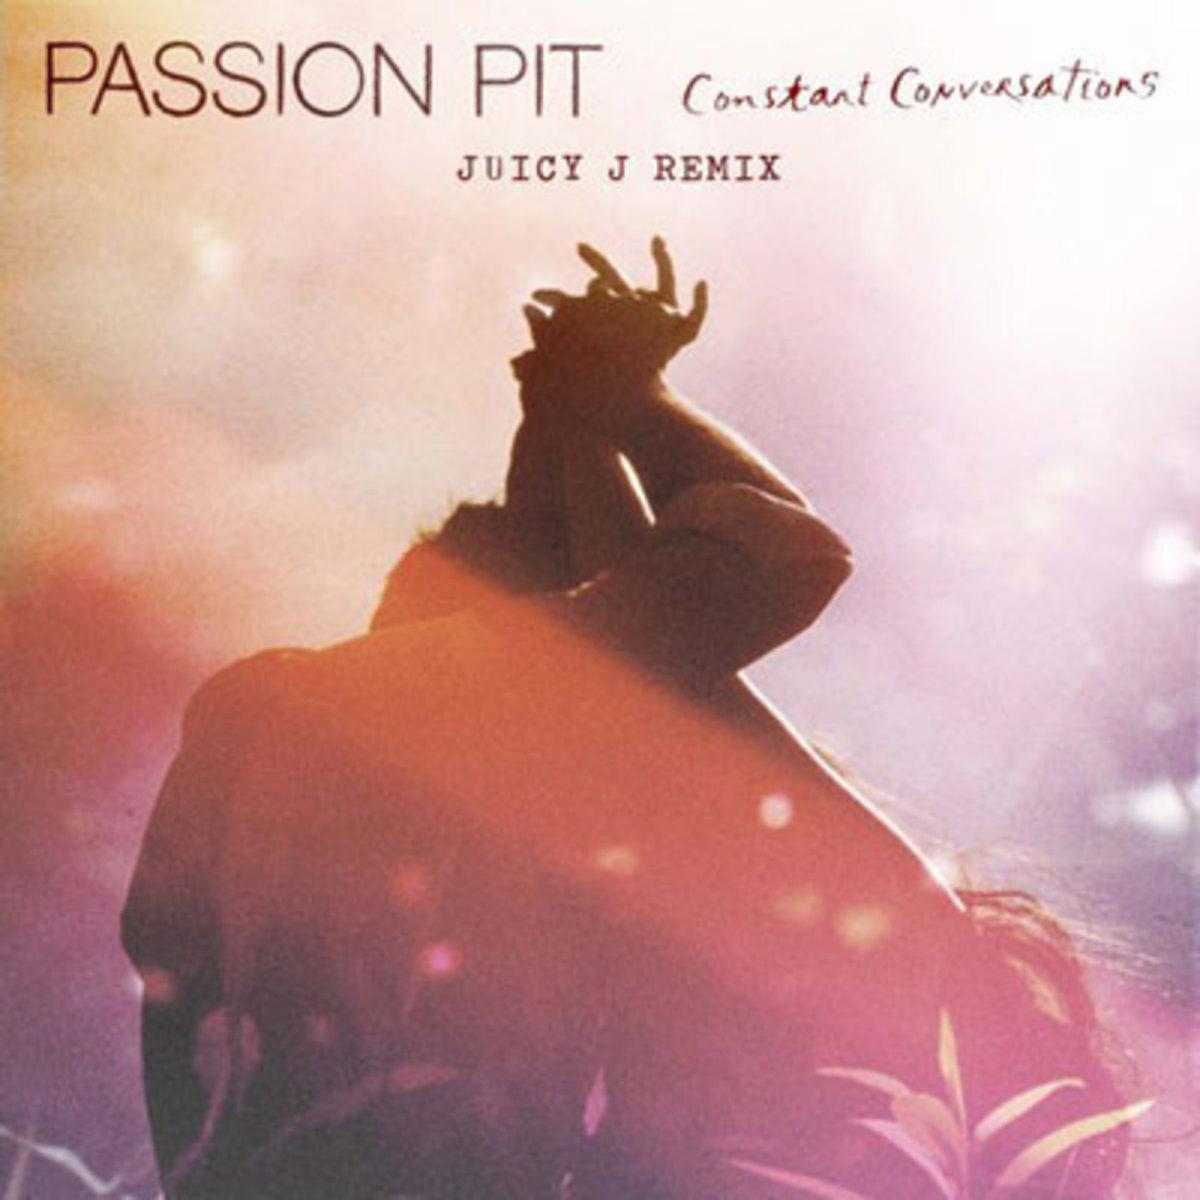 passionpit-constantconvoremix.jpg